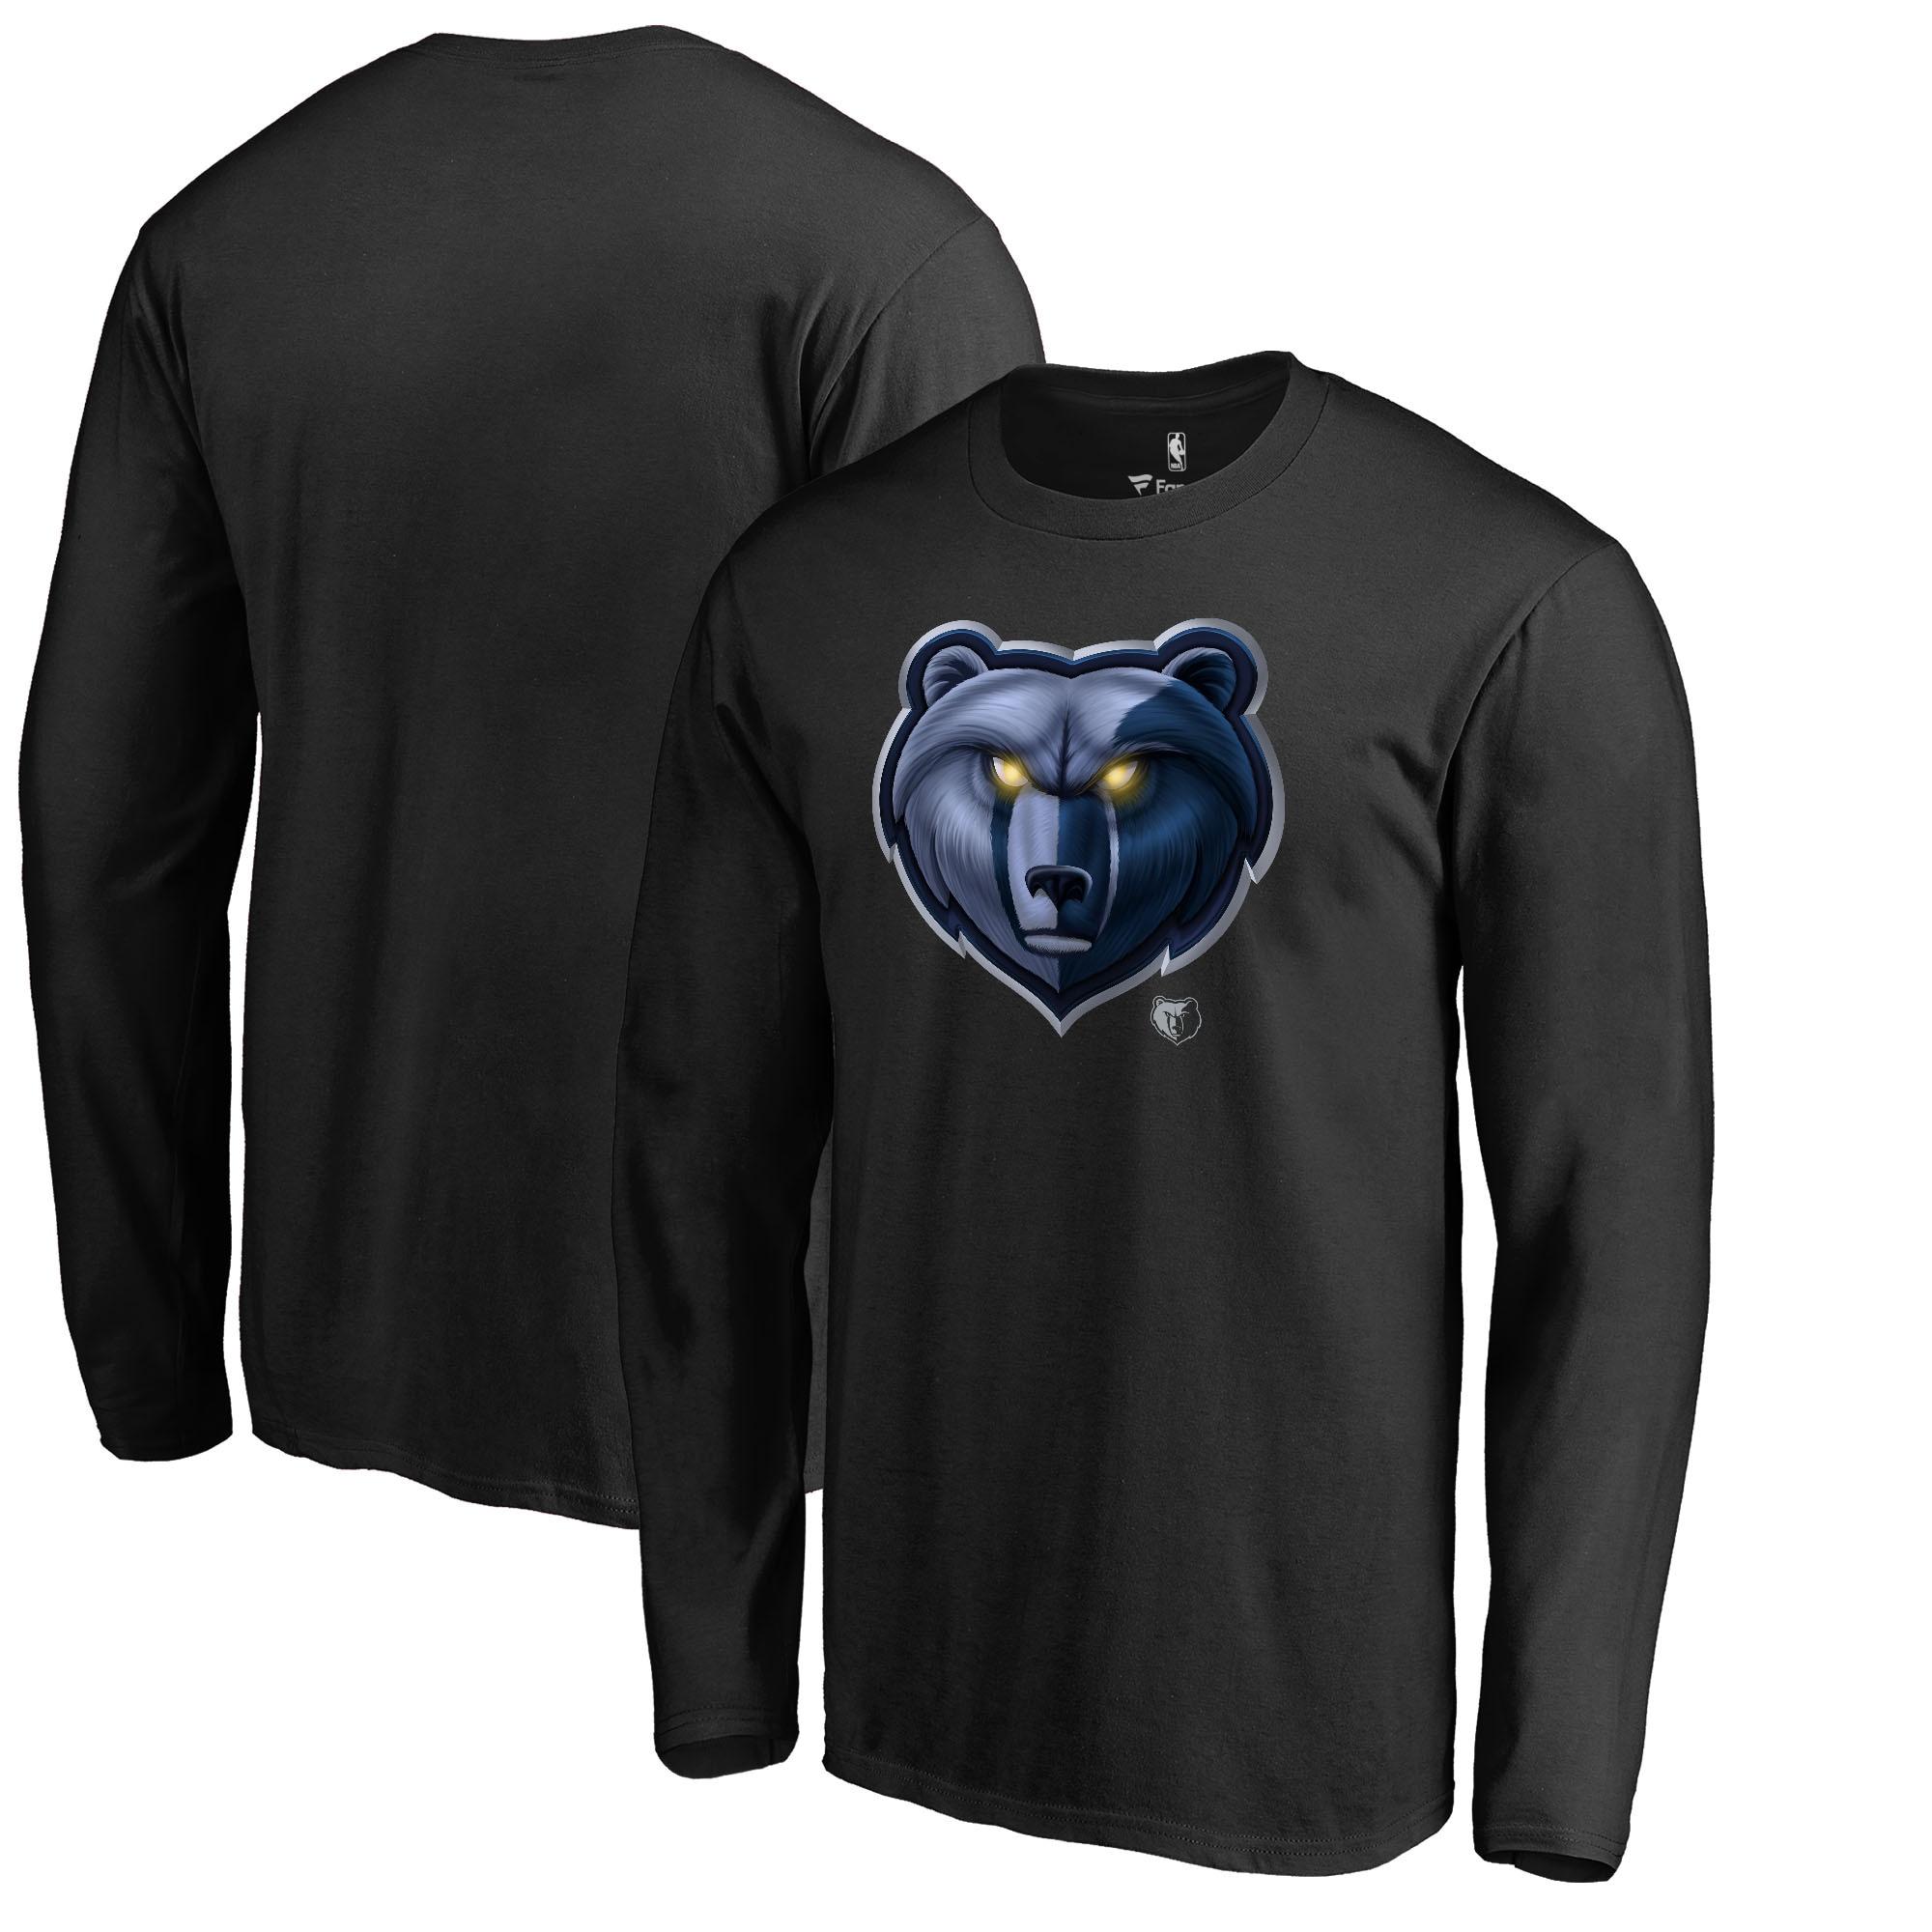 Memphis Grizzlies Fanatics Branded Midnight Mascot Long Sleeve T-Shirt - Black